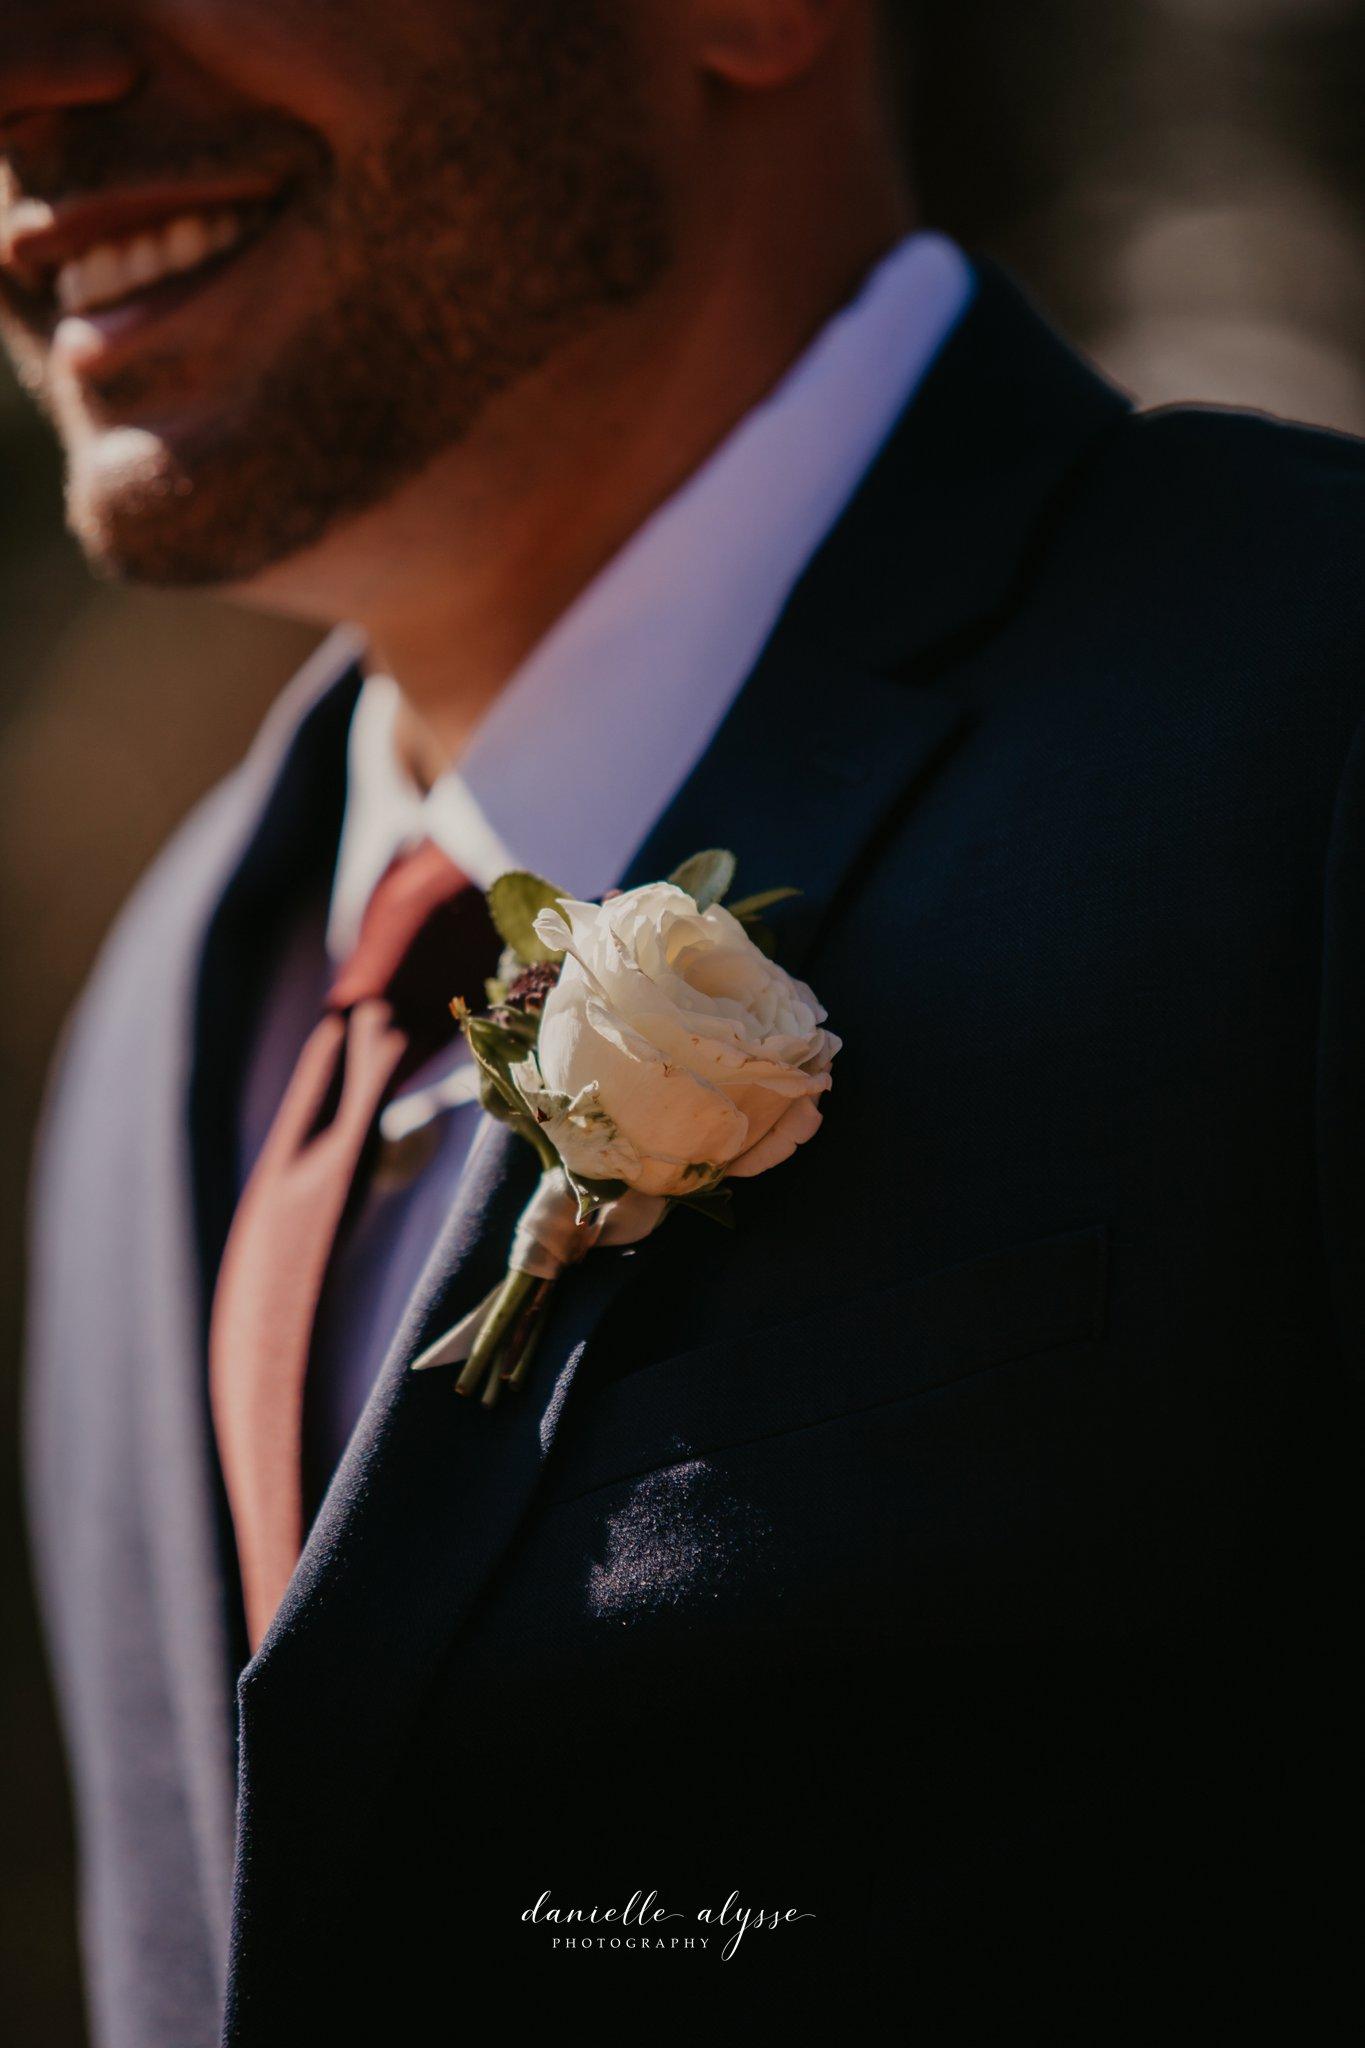 180831_wedding_stephanie_heavenly_south_lake_tahoe_danielle_alysse_photography_destination_blog_499_WEB.jpg